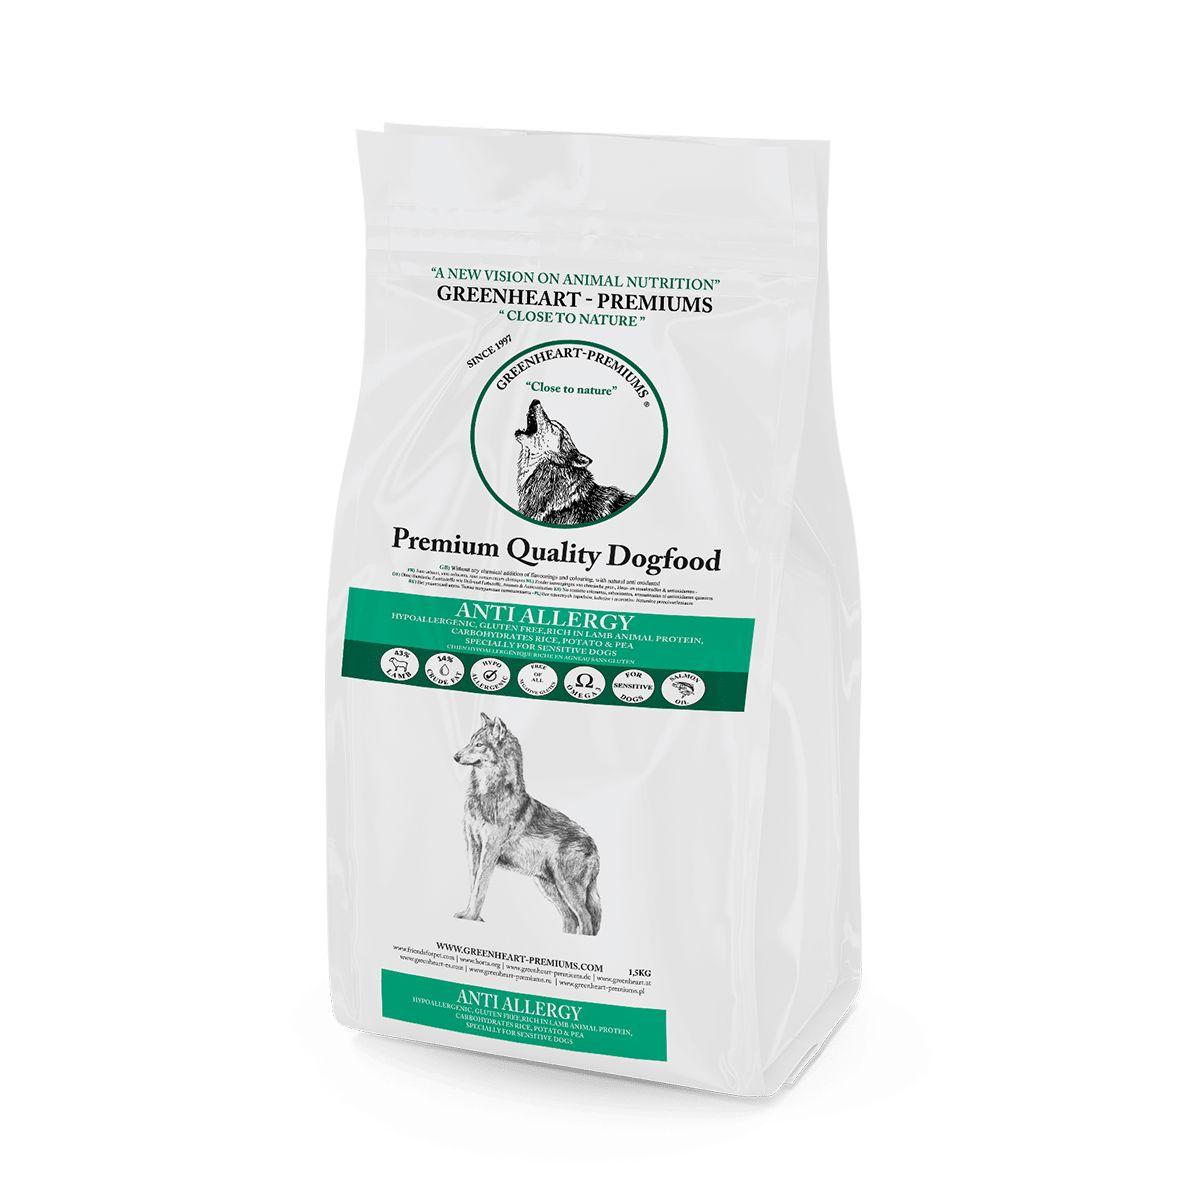 croquettes Anti Allergy Greenheart Premiums pour chiens sensibles